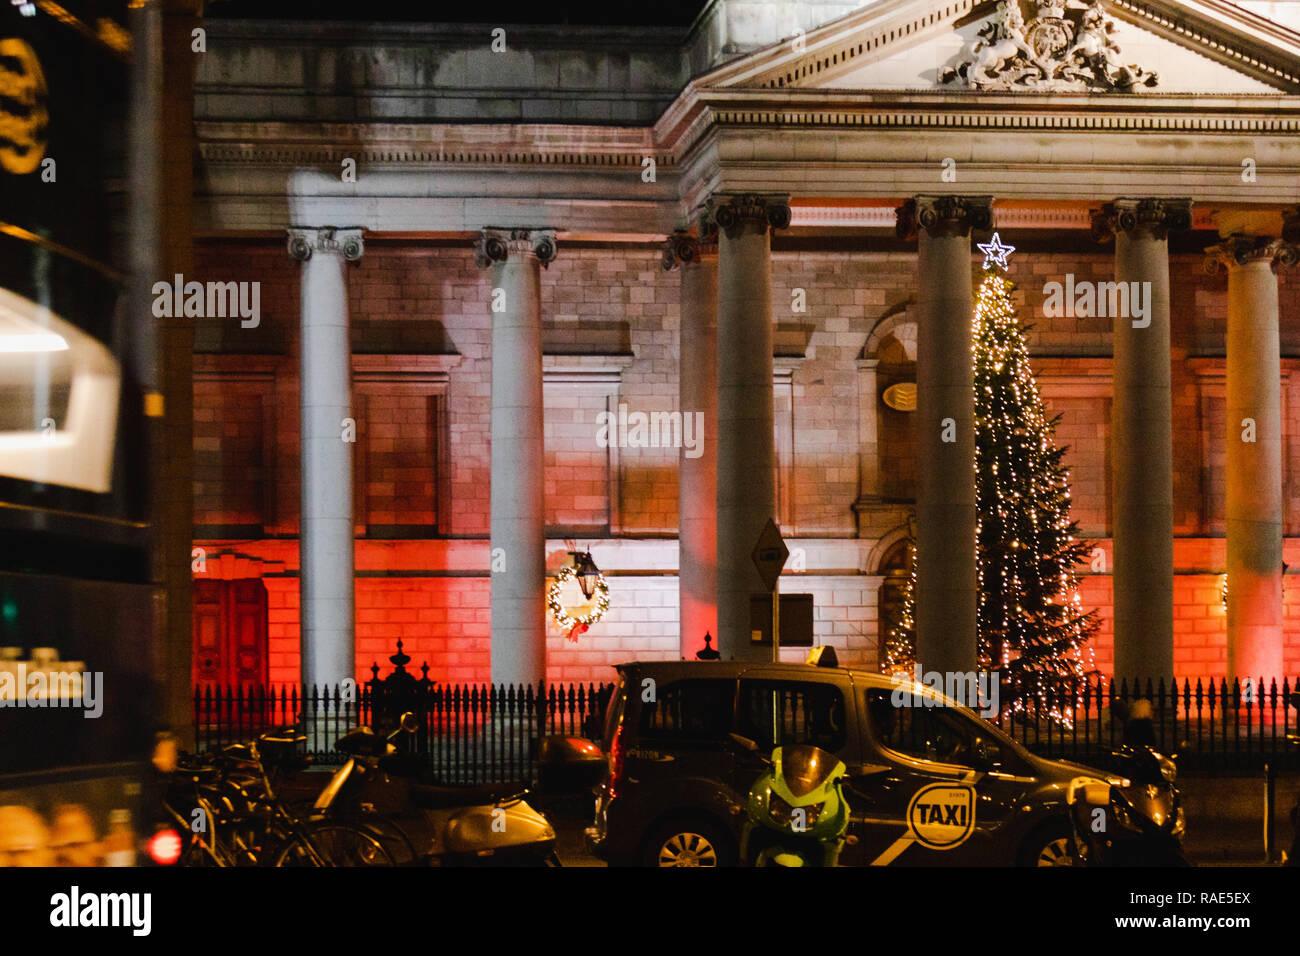 Christmas In Dublin Ireland.Dublin Ireland December 19th 2018 Architecture And